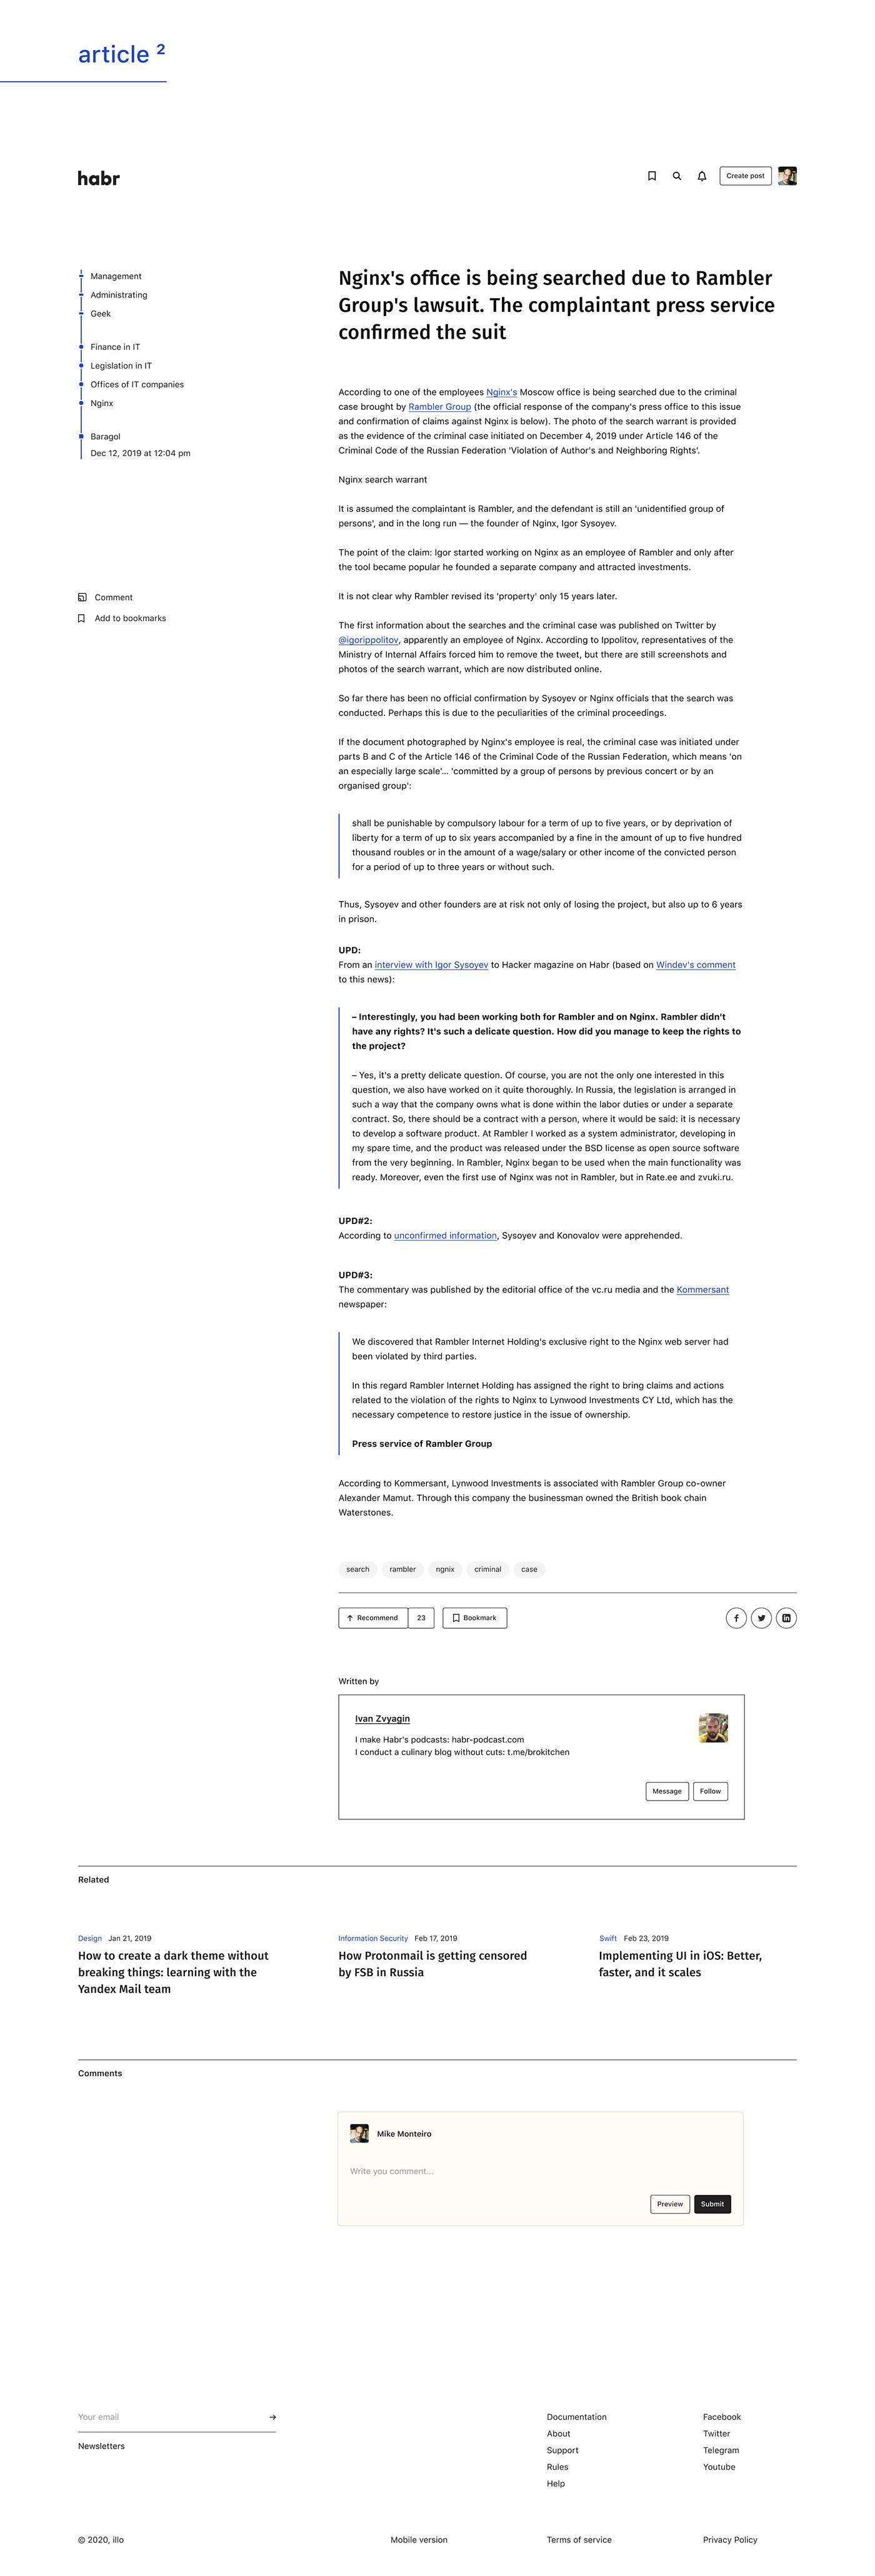 comment community habr Hub social IT media typography   UI ux